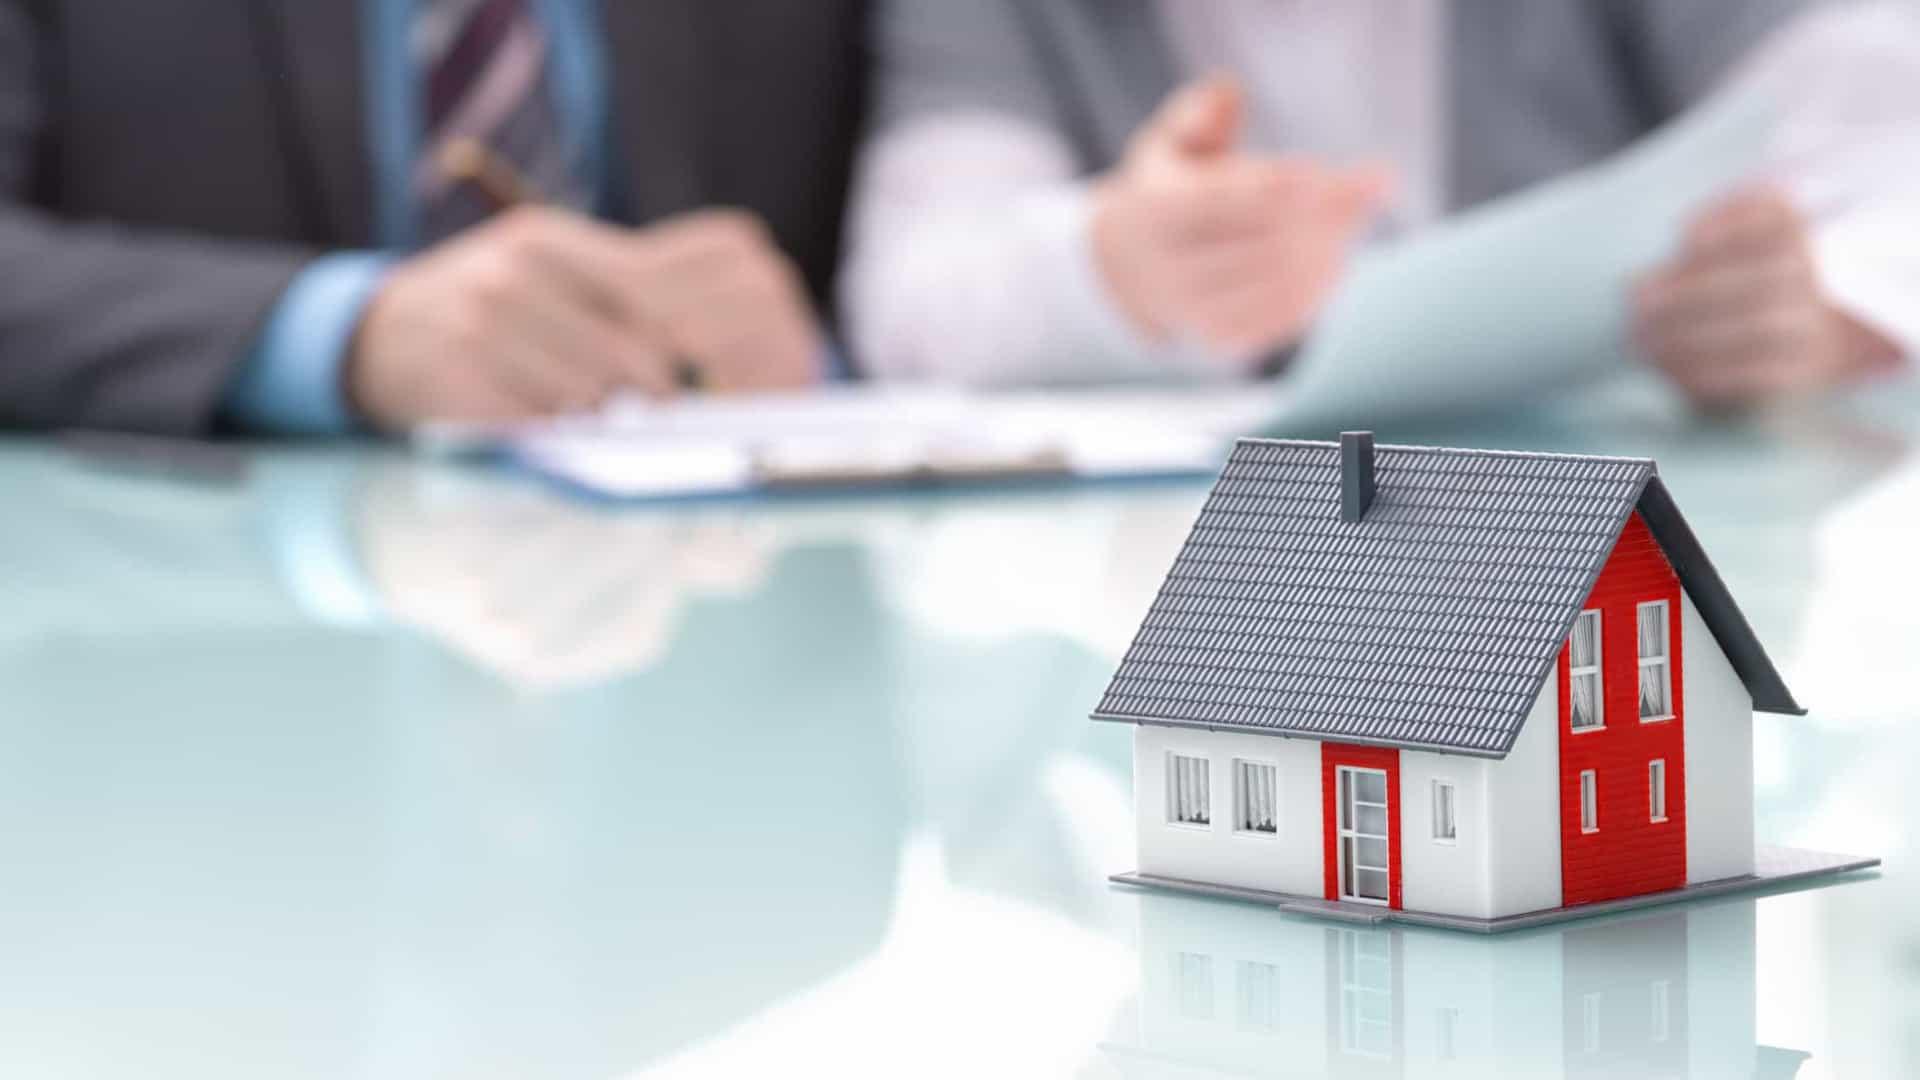 Oferta de arrendamento duplicou. Rendas caíram 9,4% no primeiro trimestre